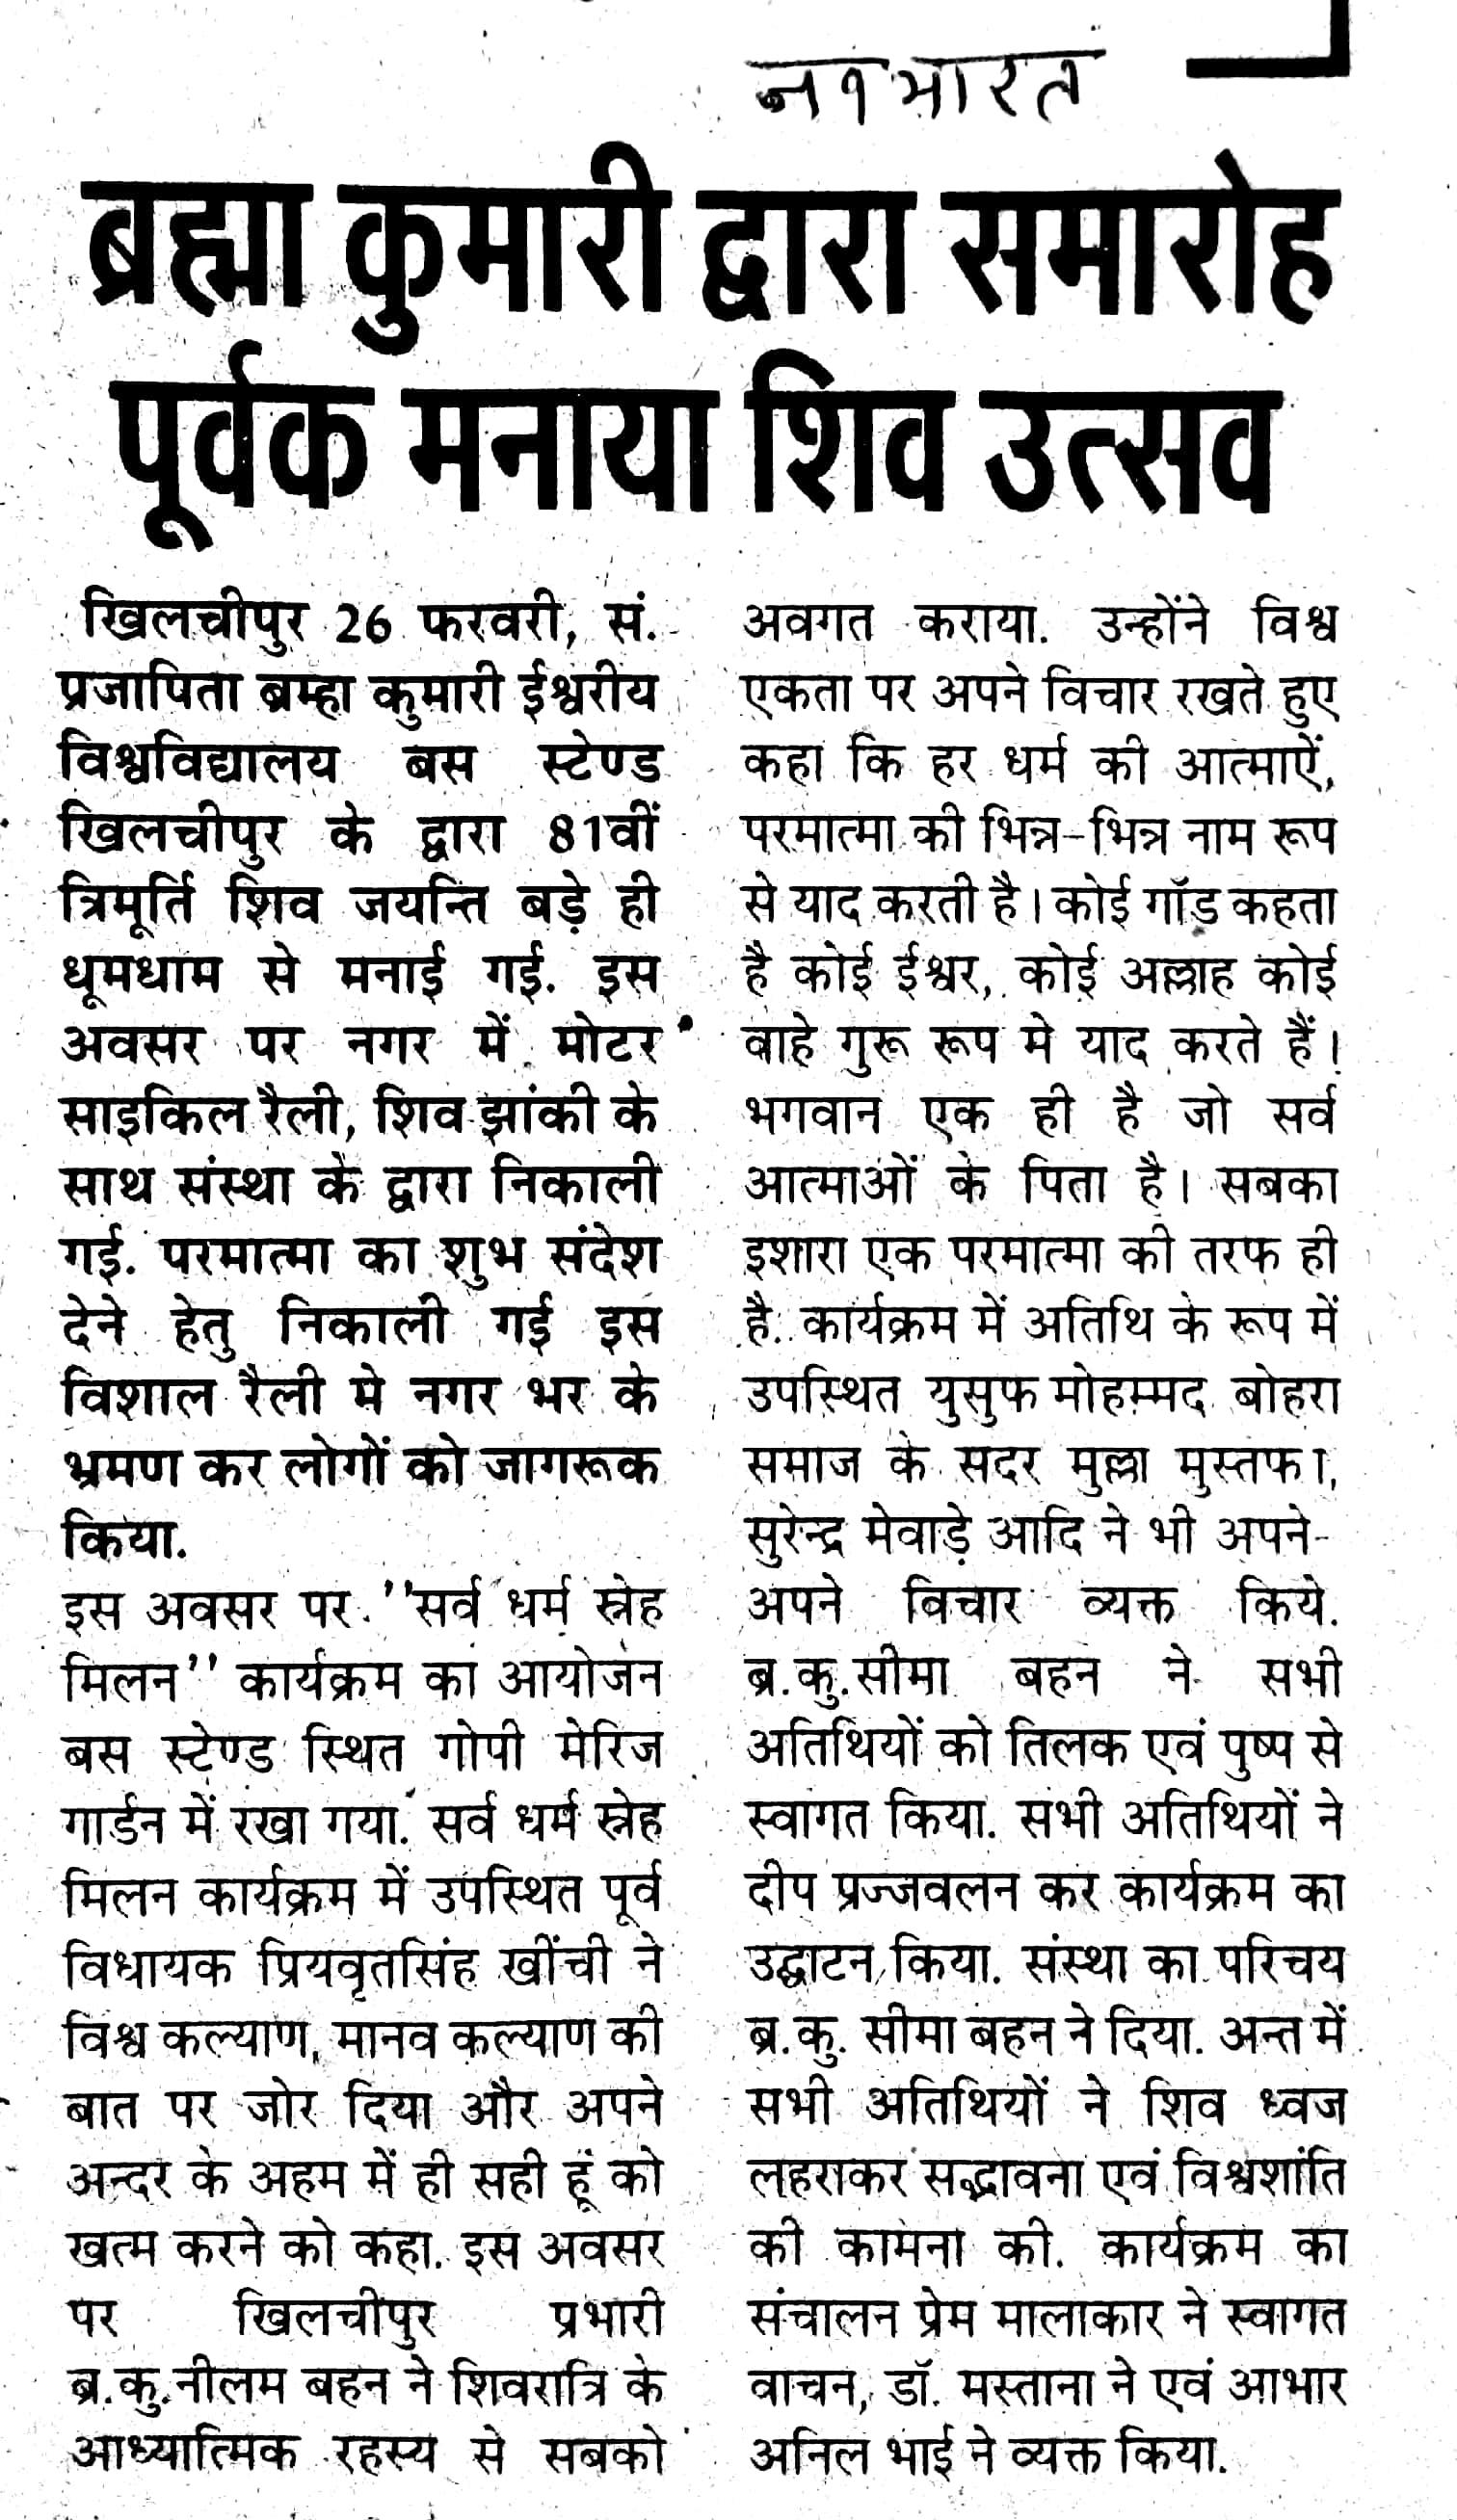 khilchipur 2017_1